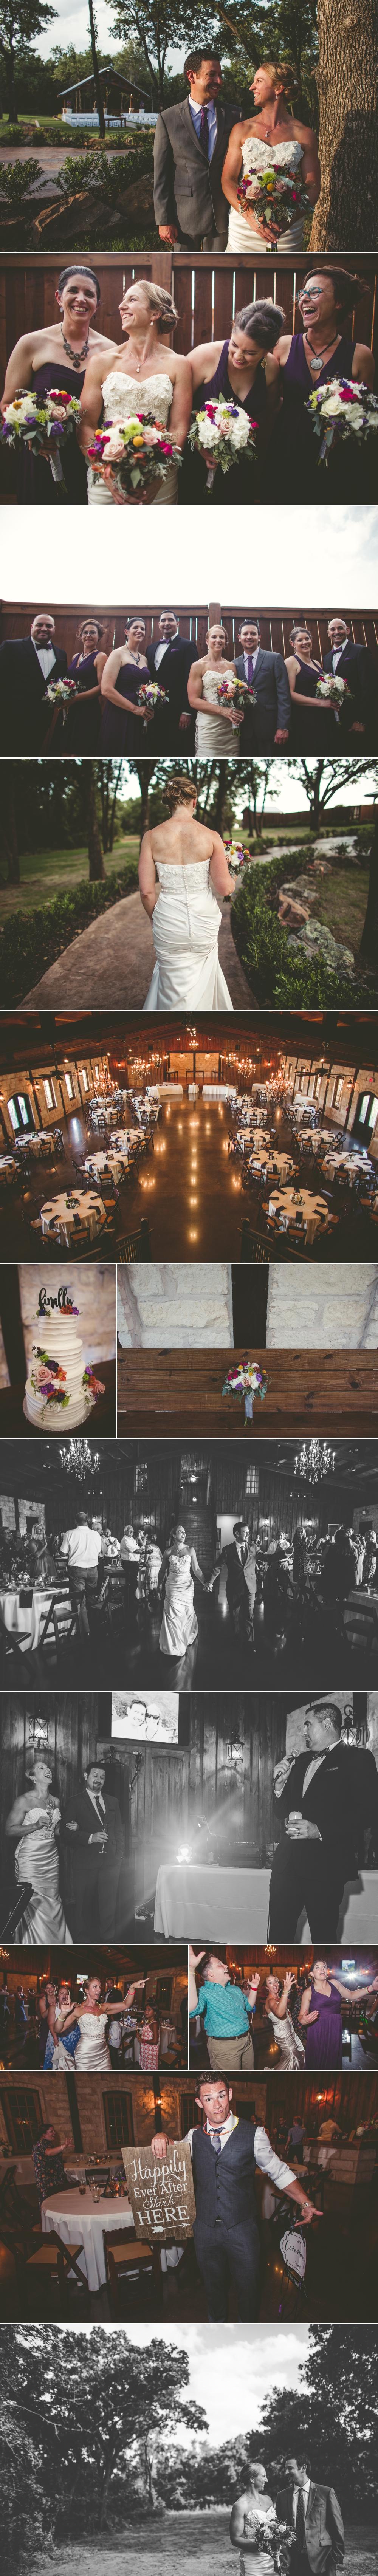 jason_domingues_photography_oklahoma_wedding_best_kansas_city_photographer_the_springs_0004